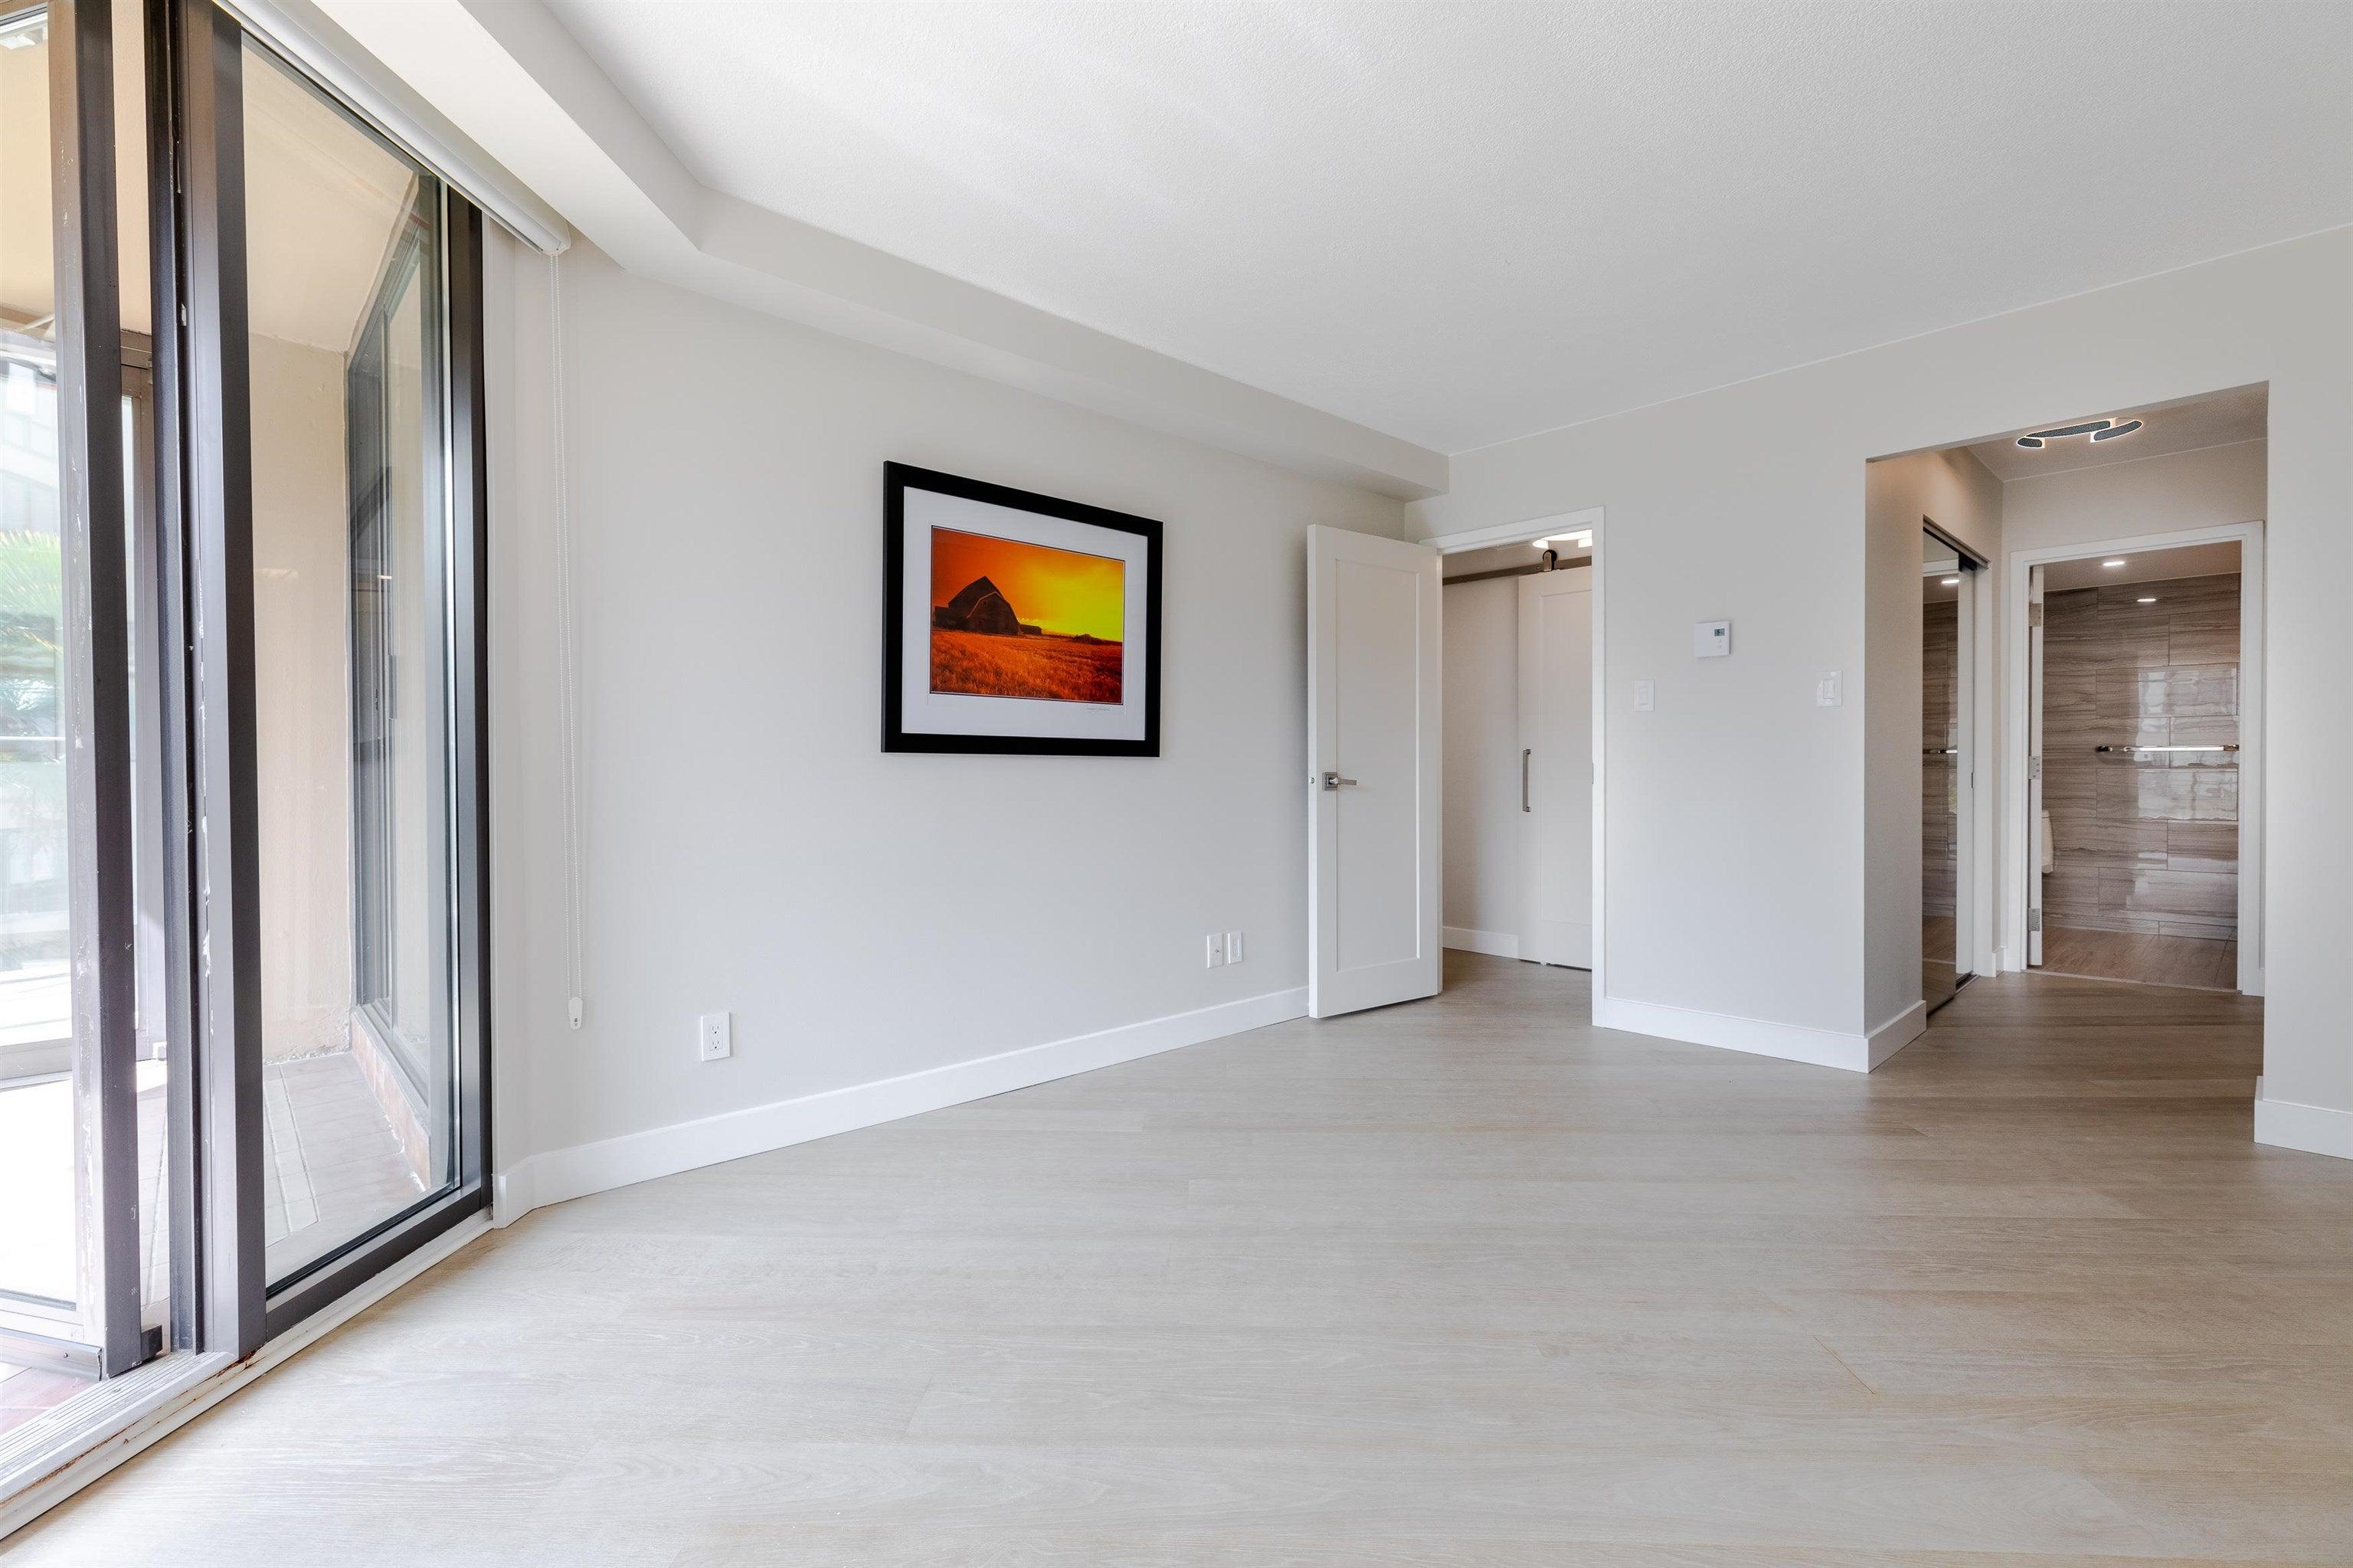 406 1450 PENNYFARTHING DRIVE - False Creek Apartment/Condo for sale, 2 Bedrooms (R2617259) - #26